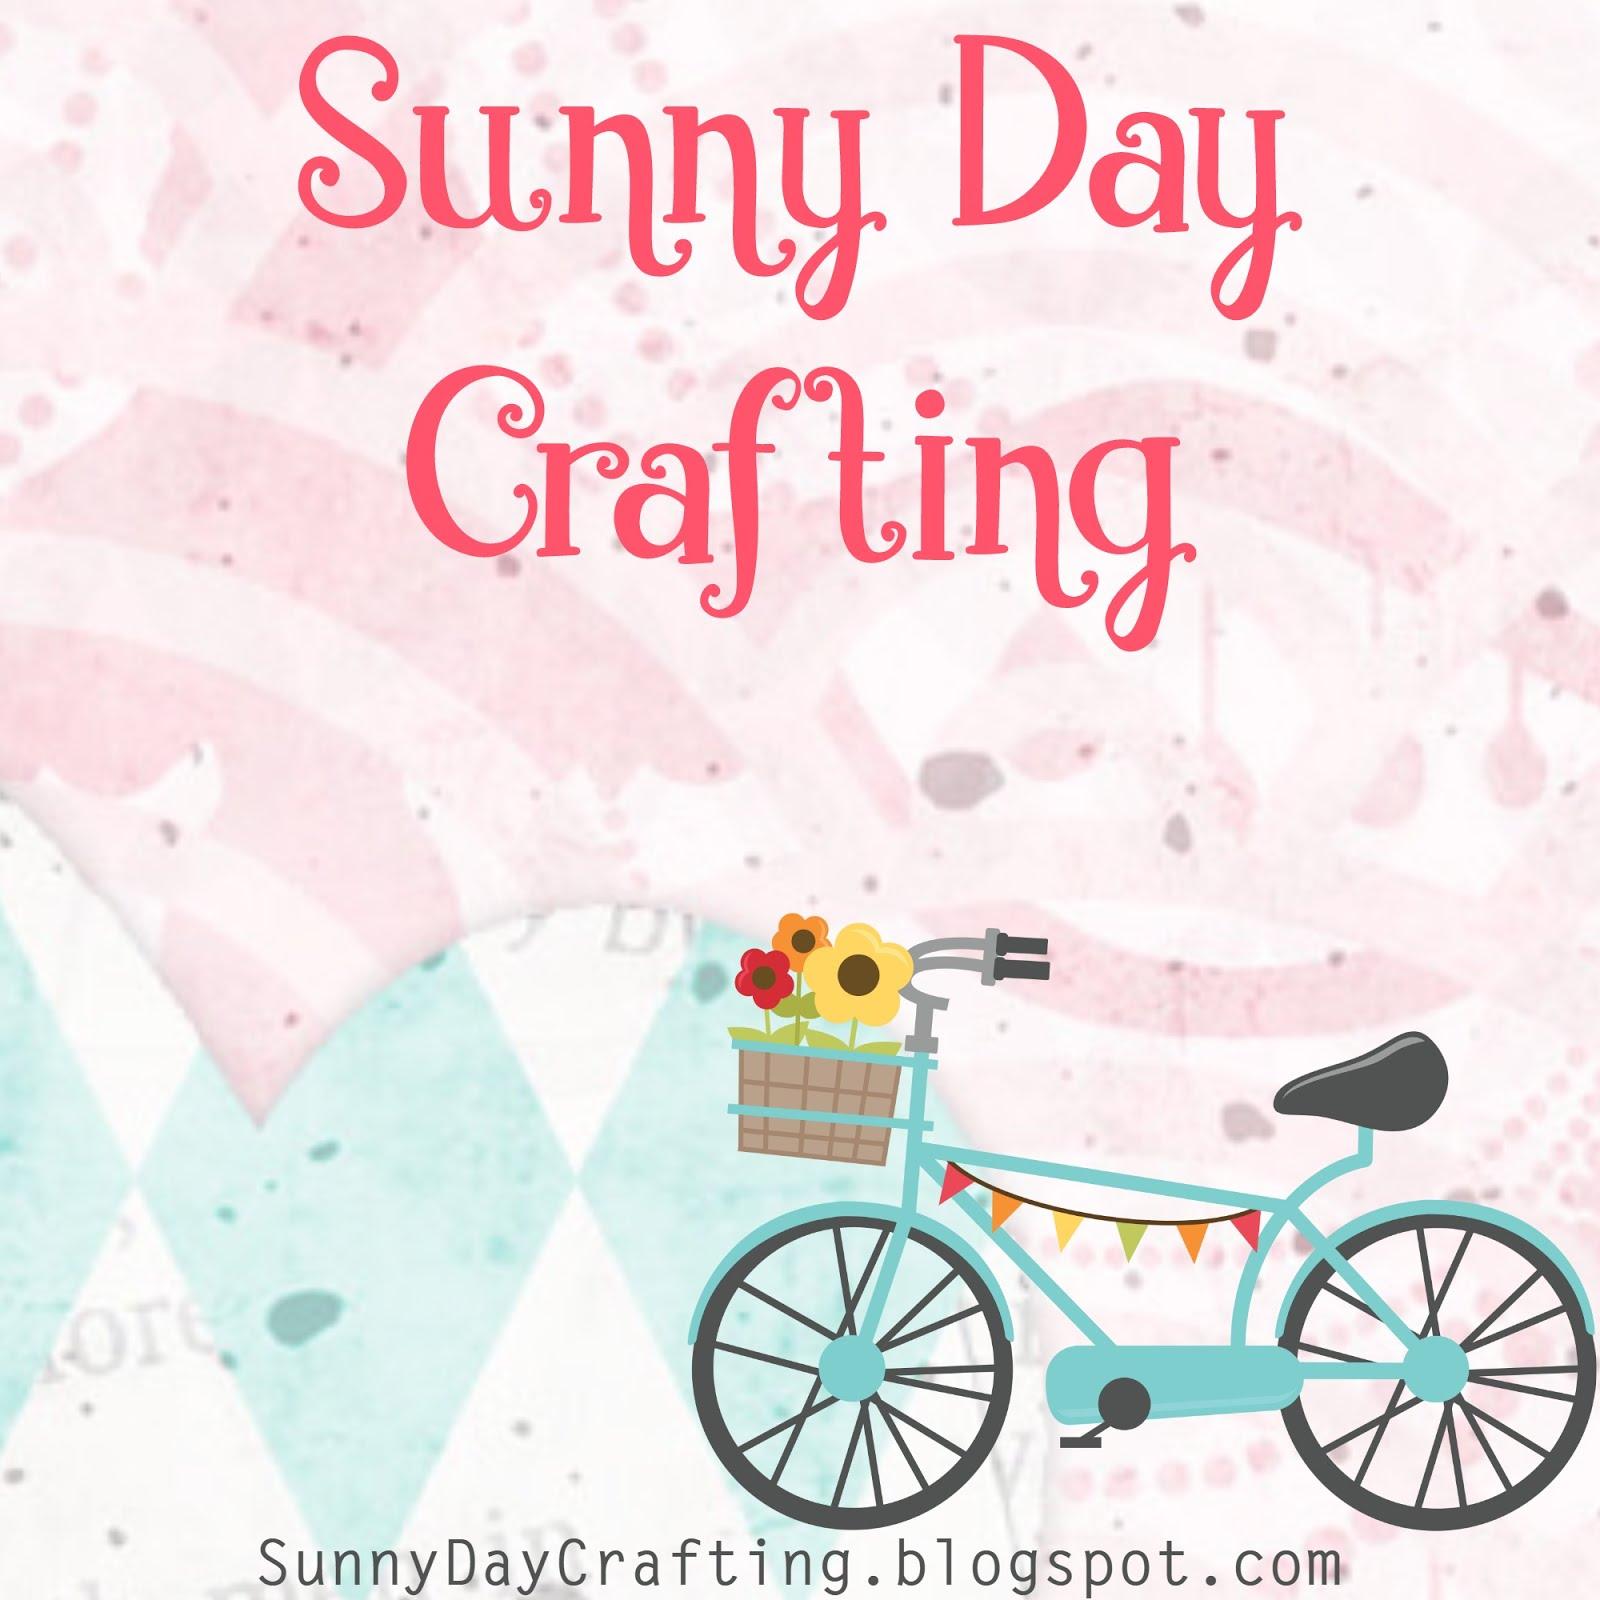 SD Crafting